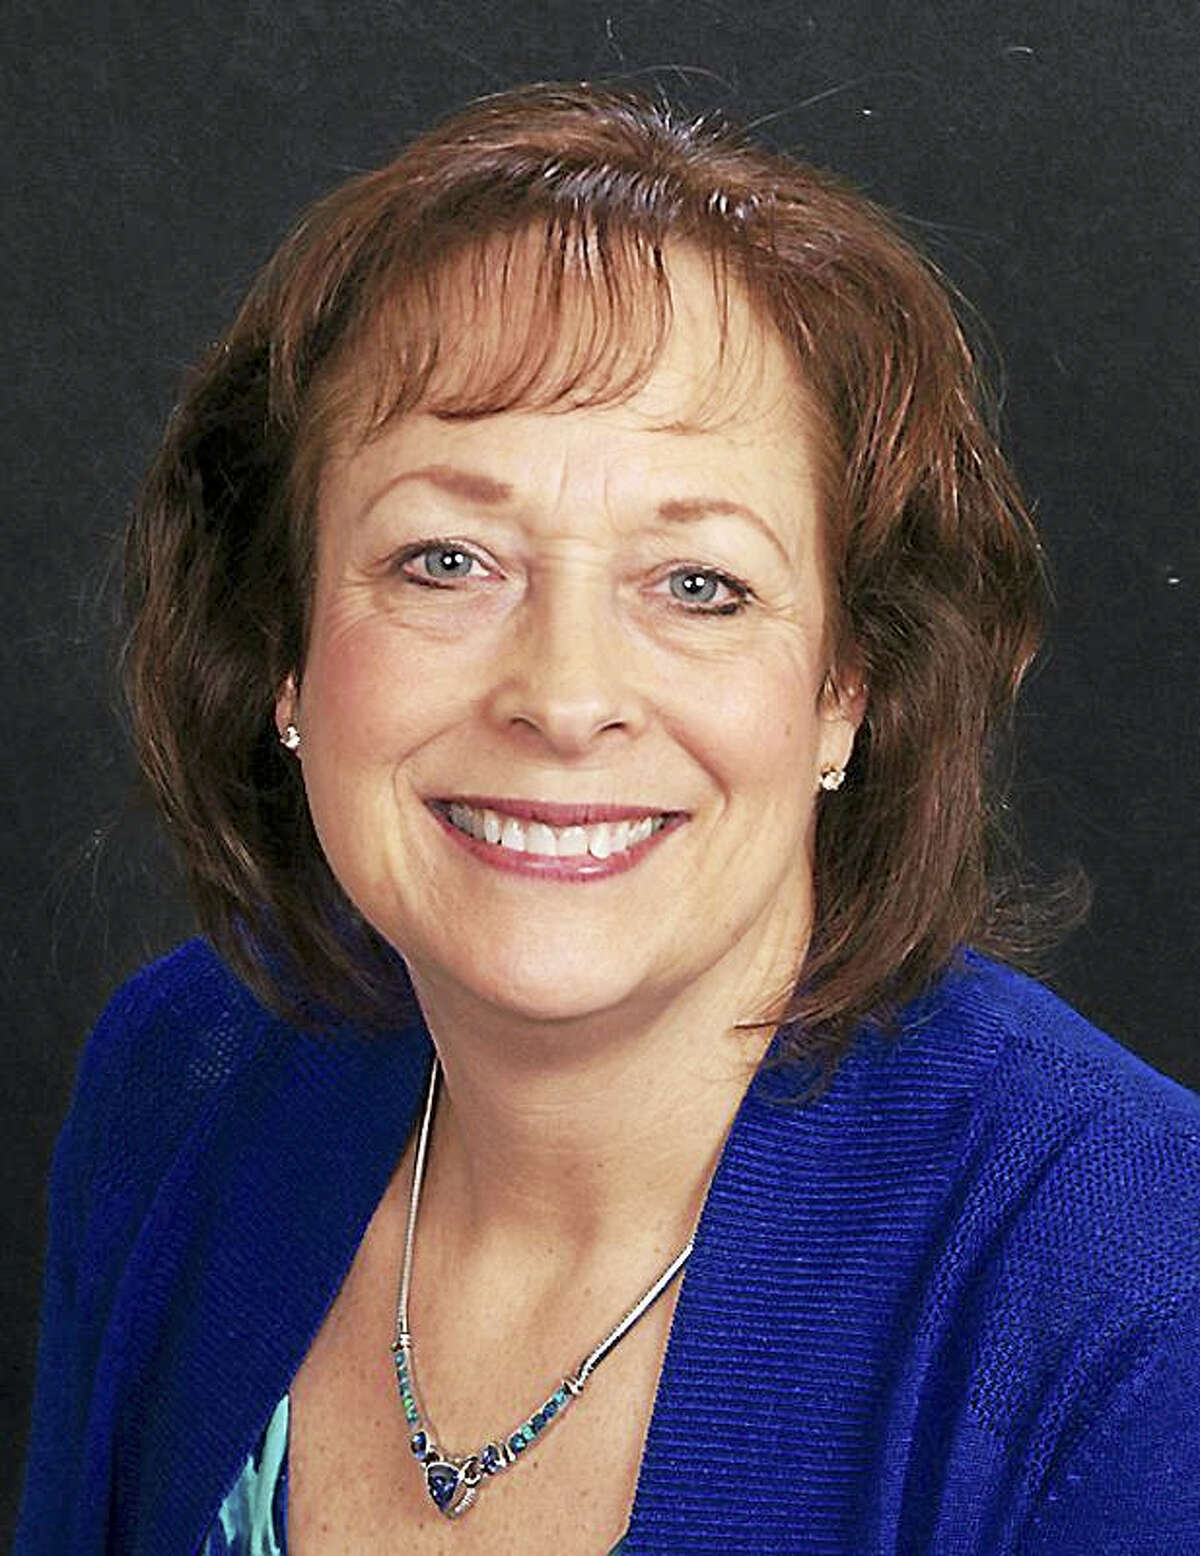 North Haven: Cynthia Mazzaferro, author of